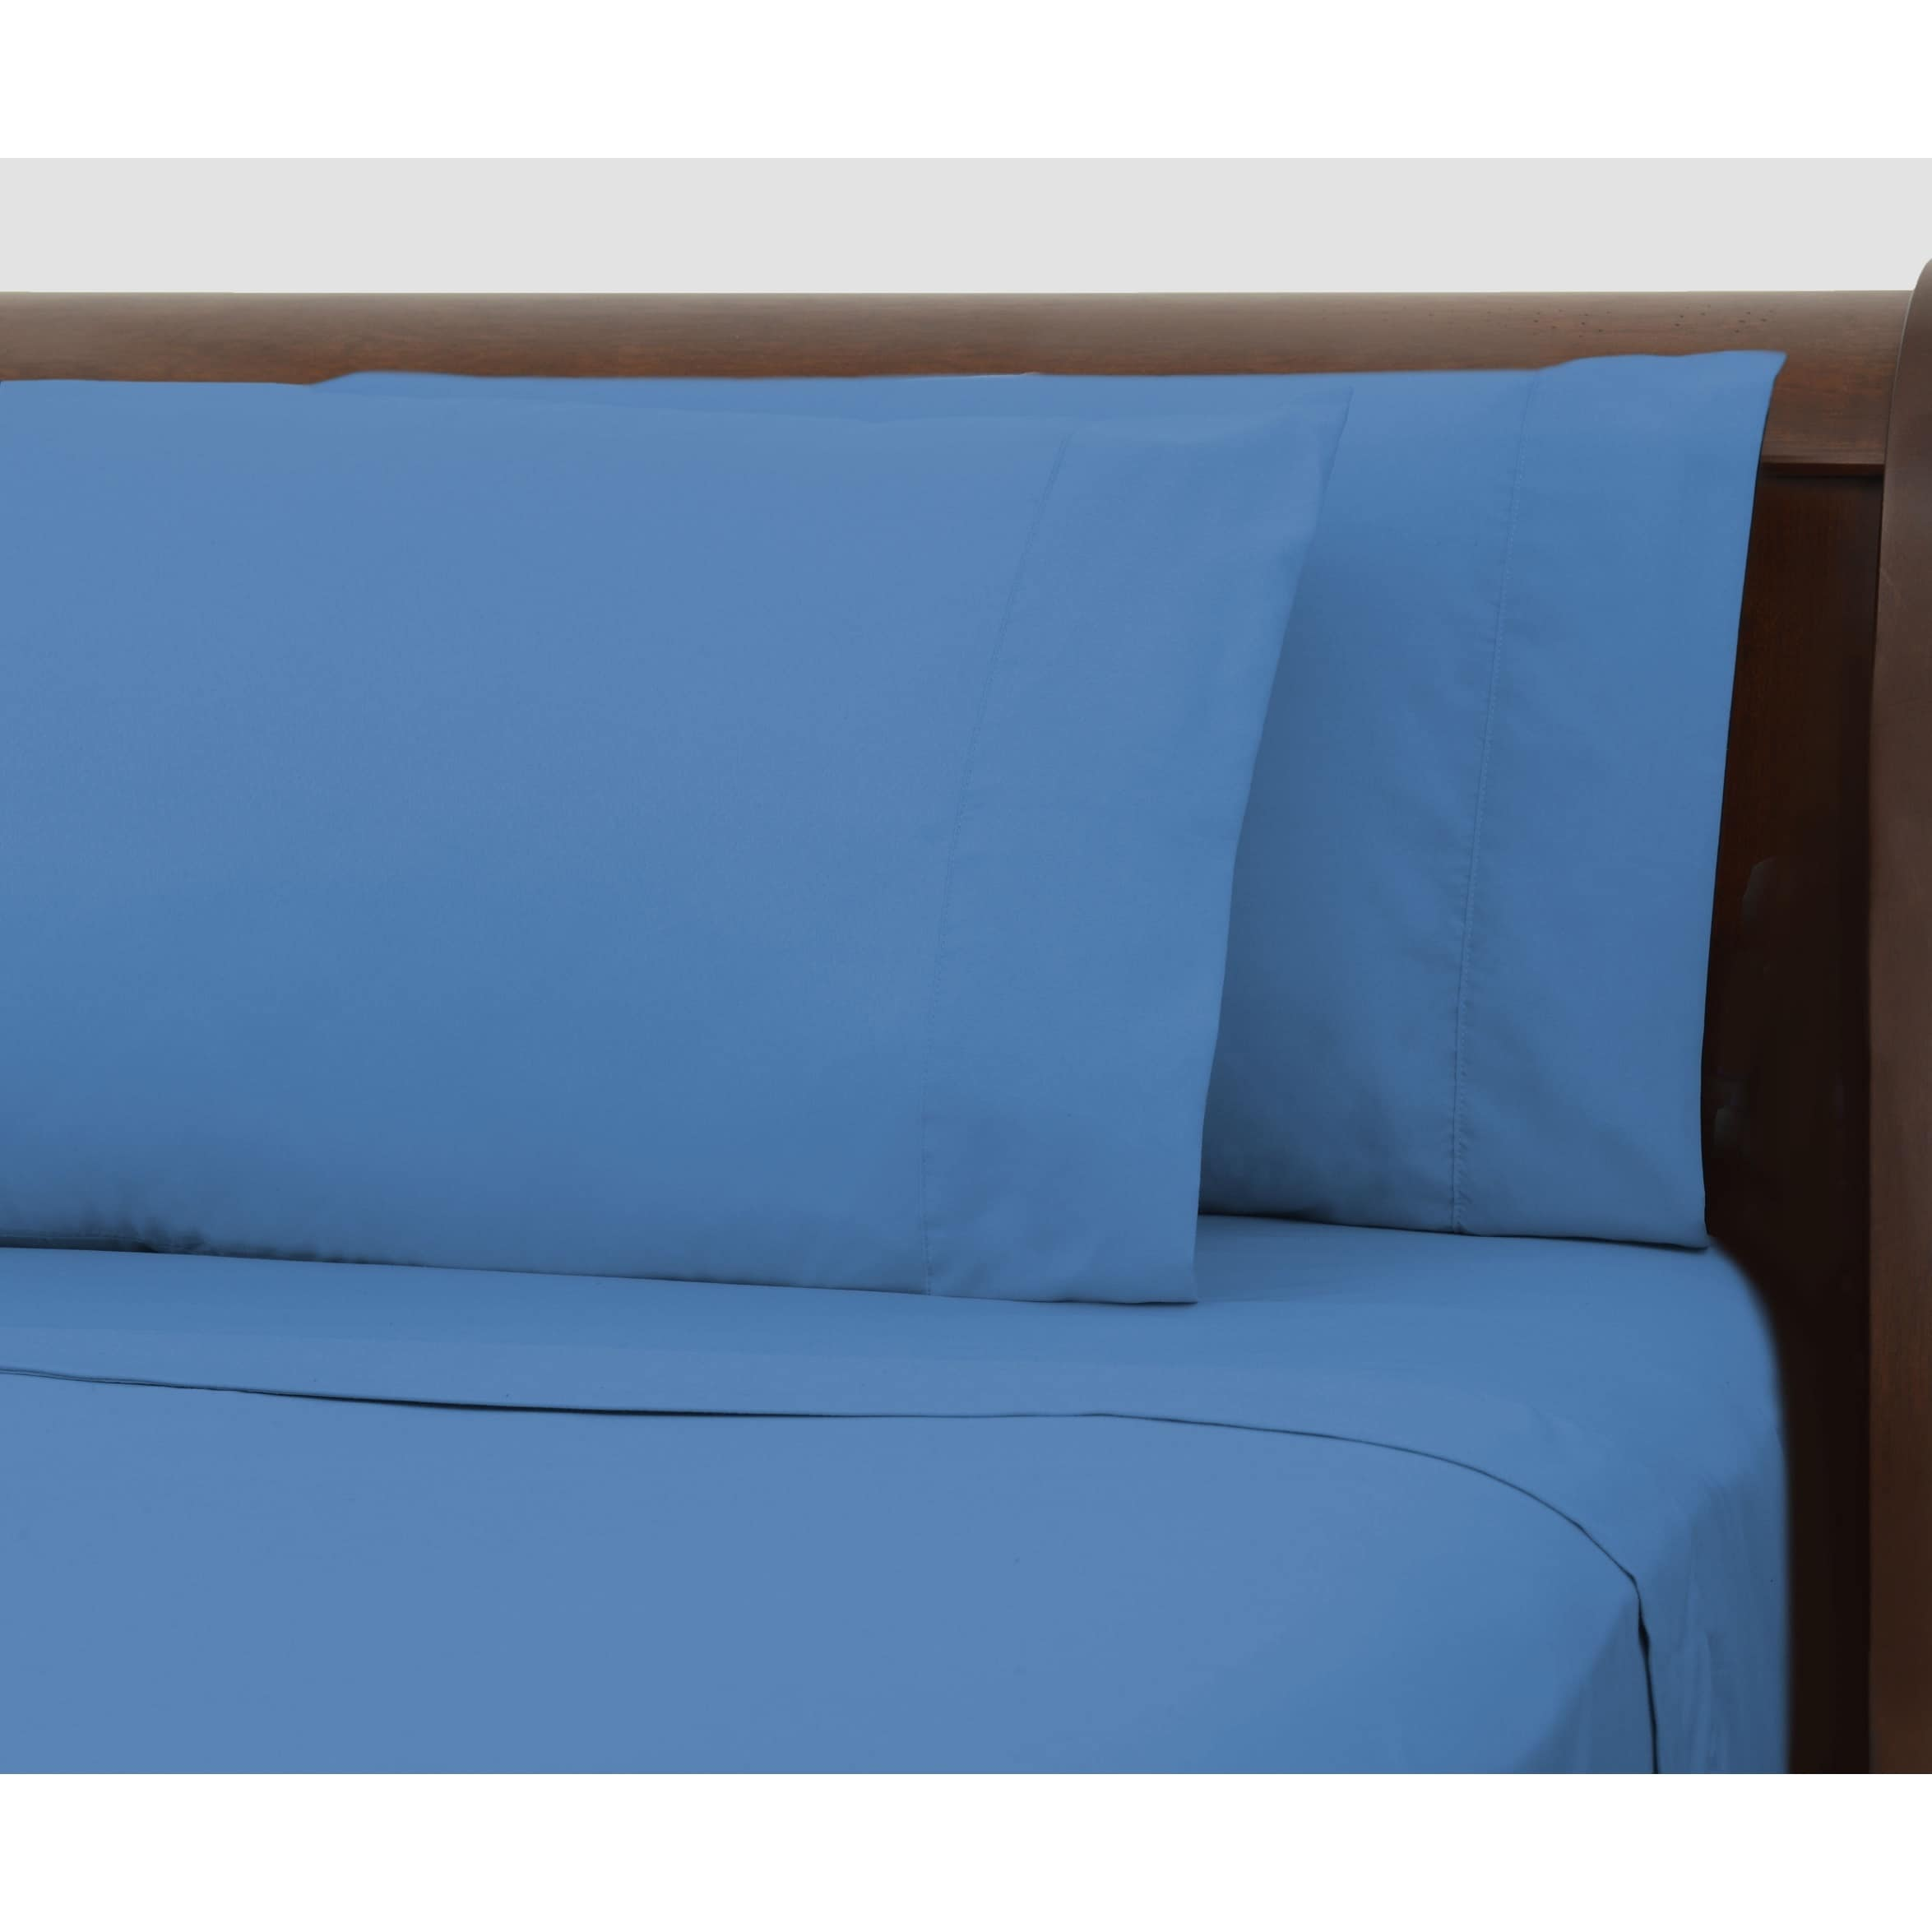 Bright Ideas Blue Wrinkle Resistant Sheet Set Overstock 9164706